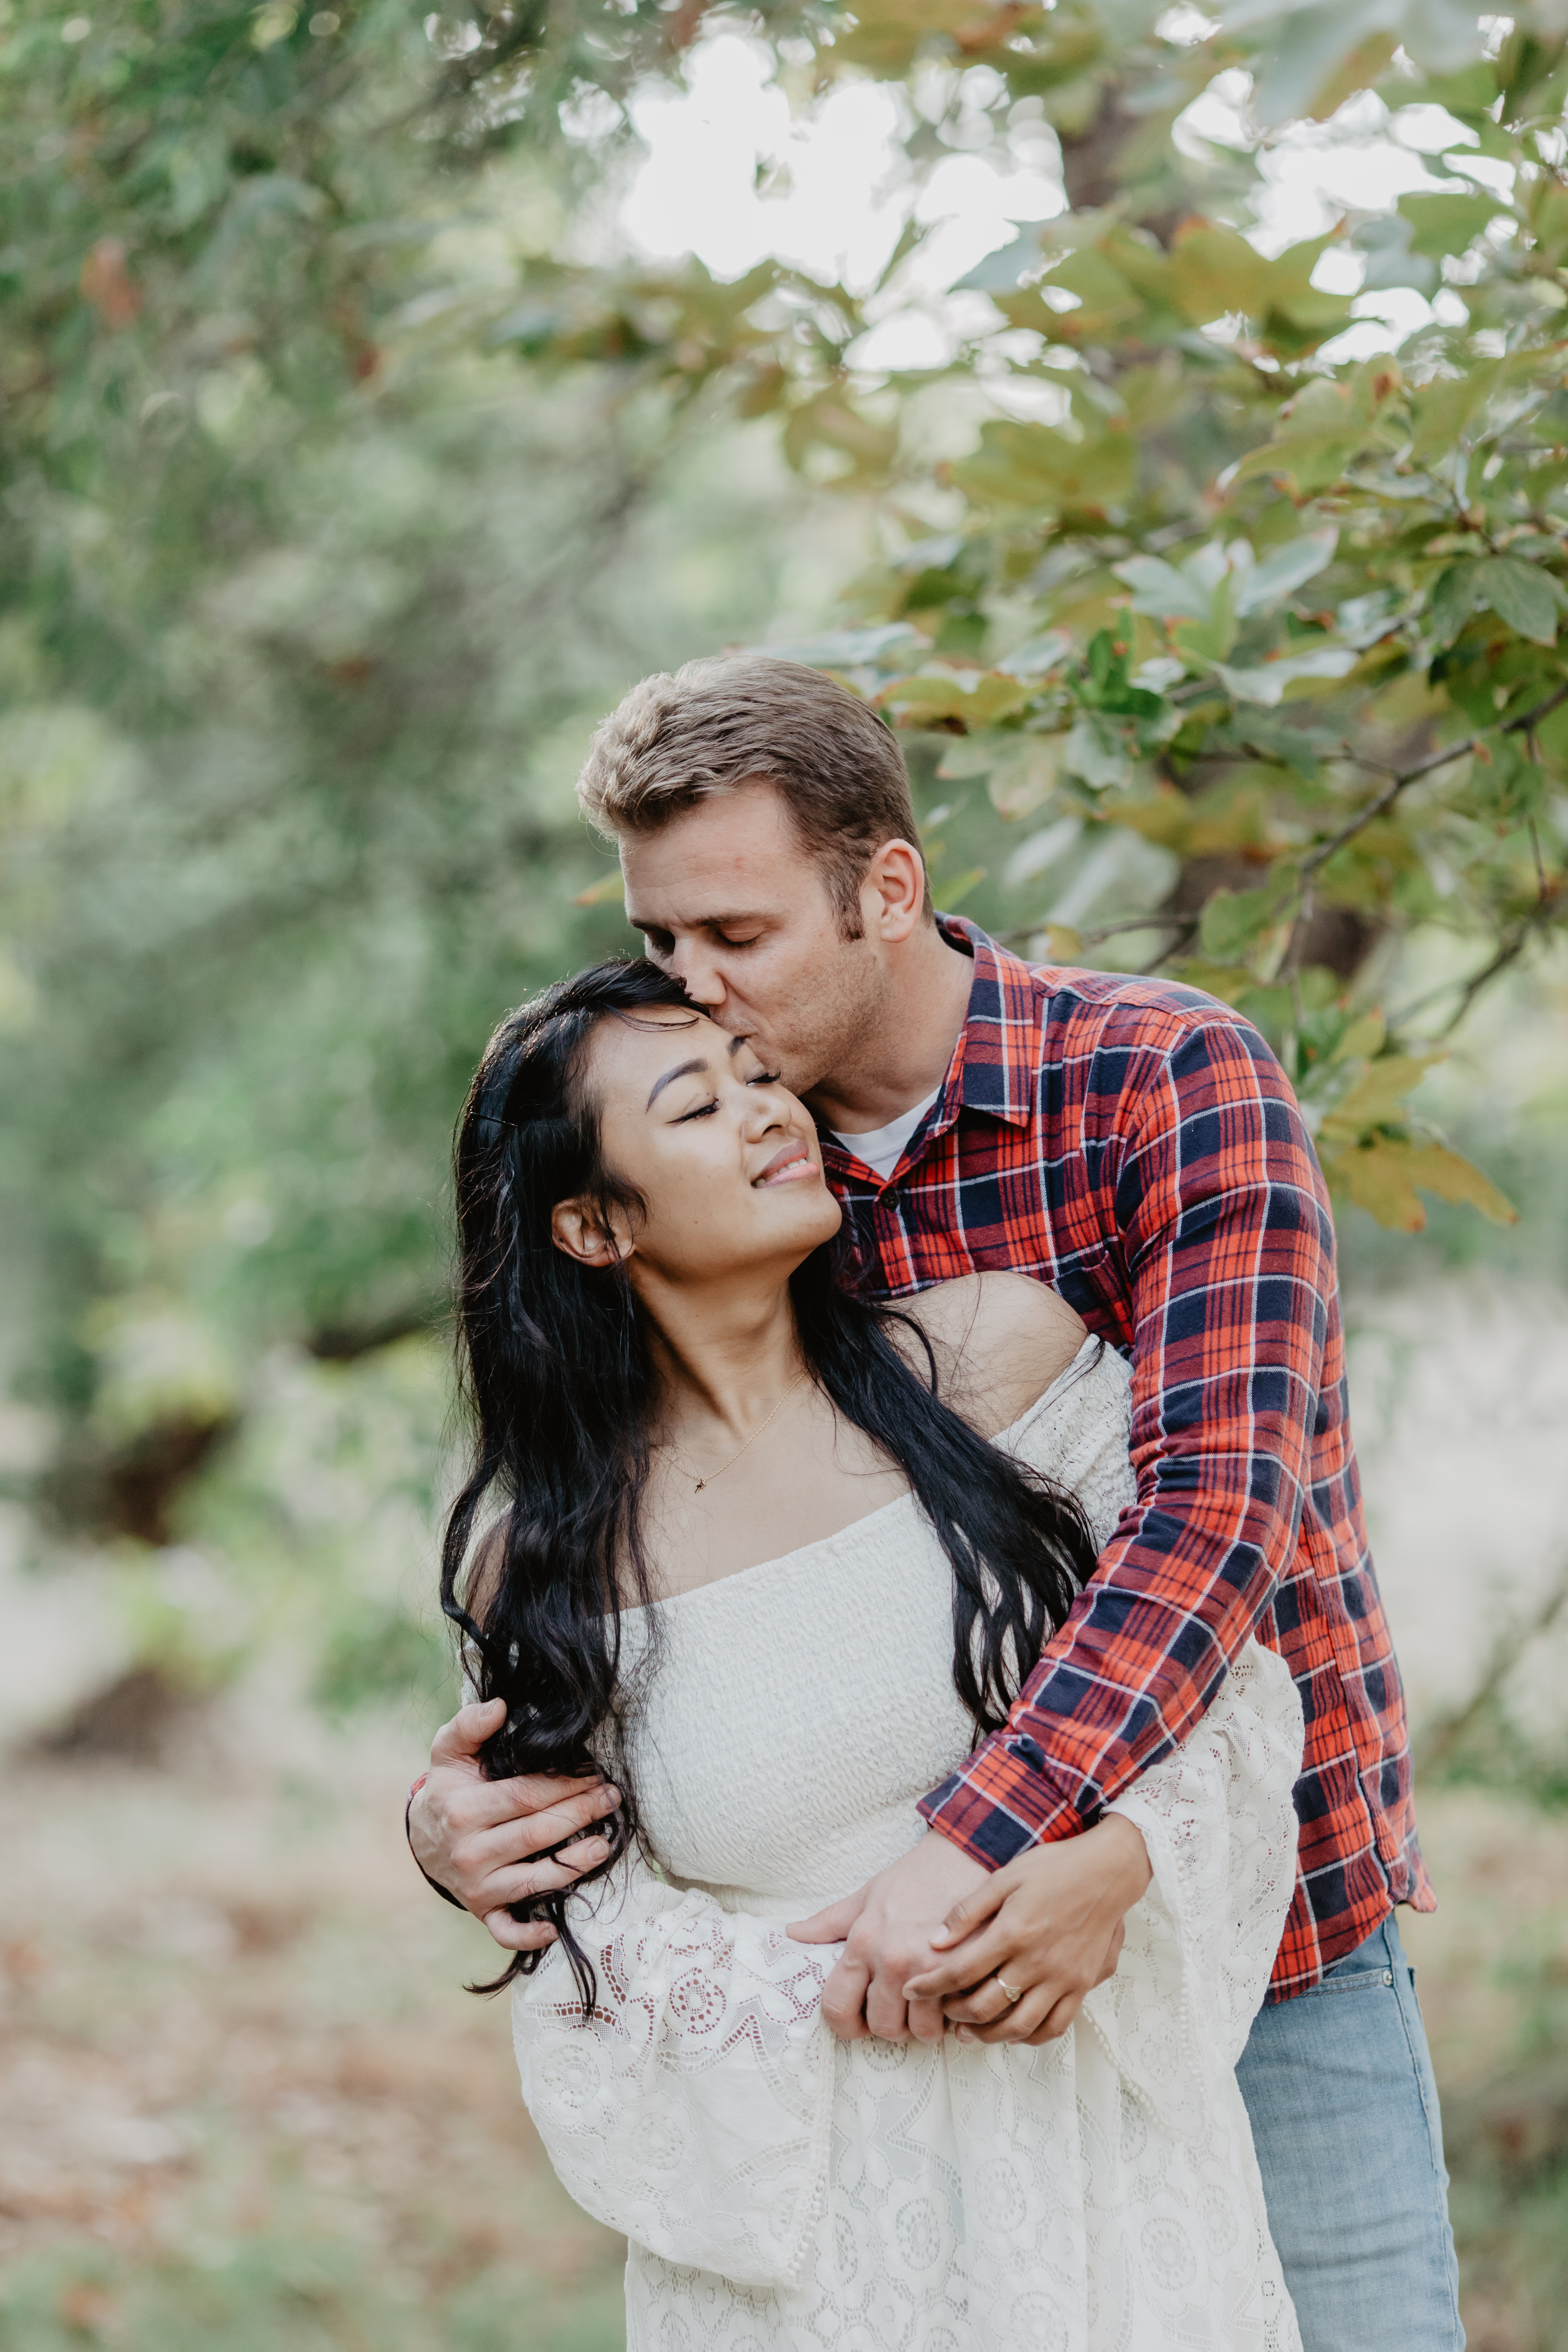 IMG 4271 - Lei and Matthew | Engaged | San Diego wedding photographer